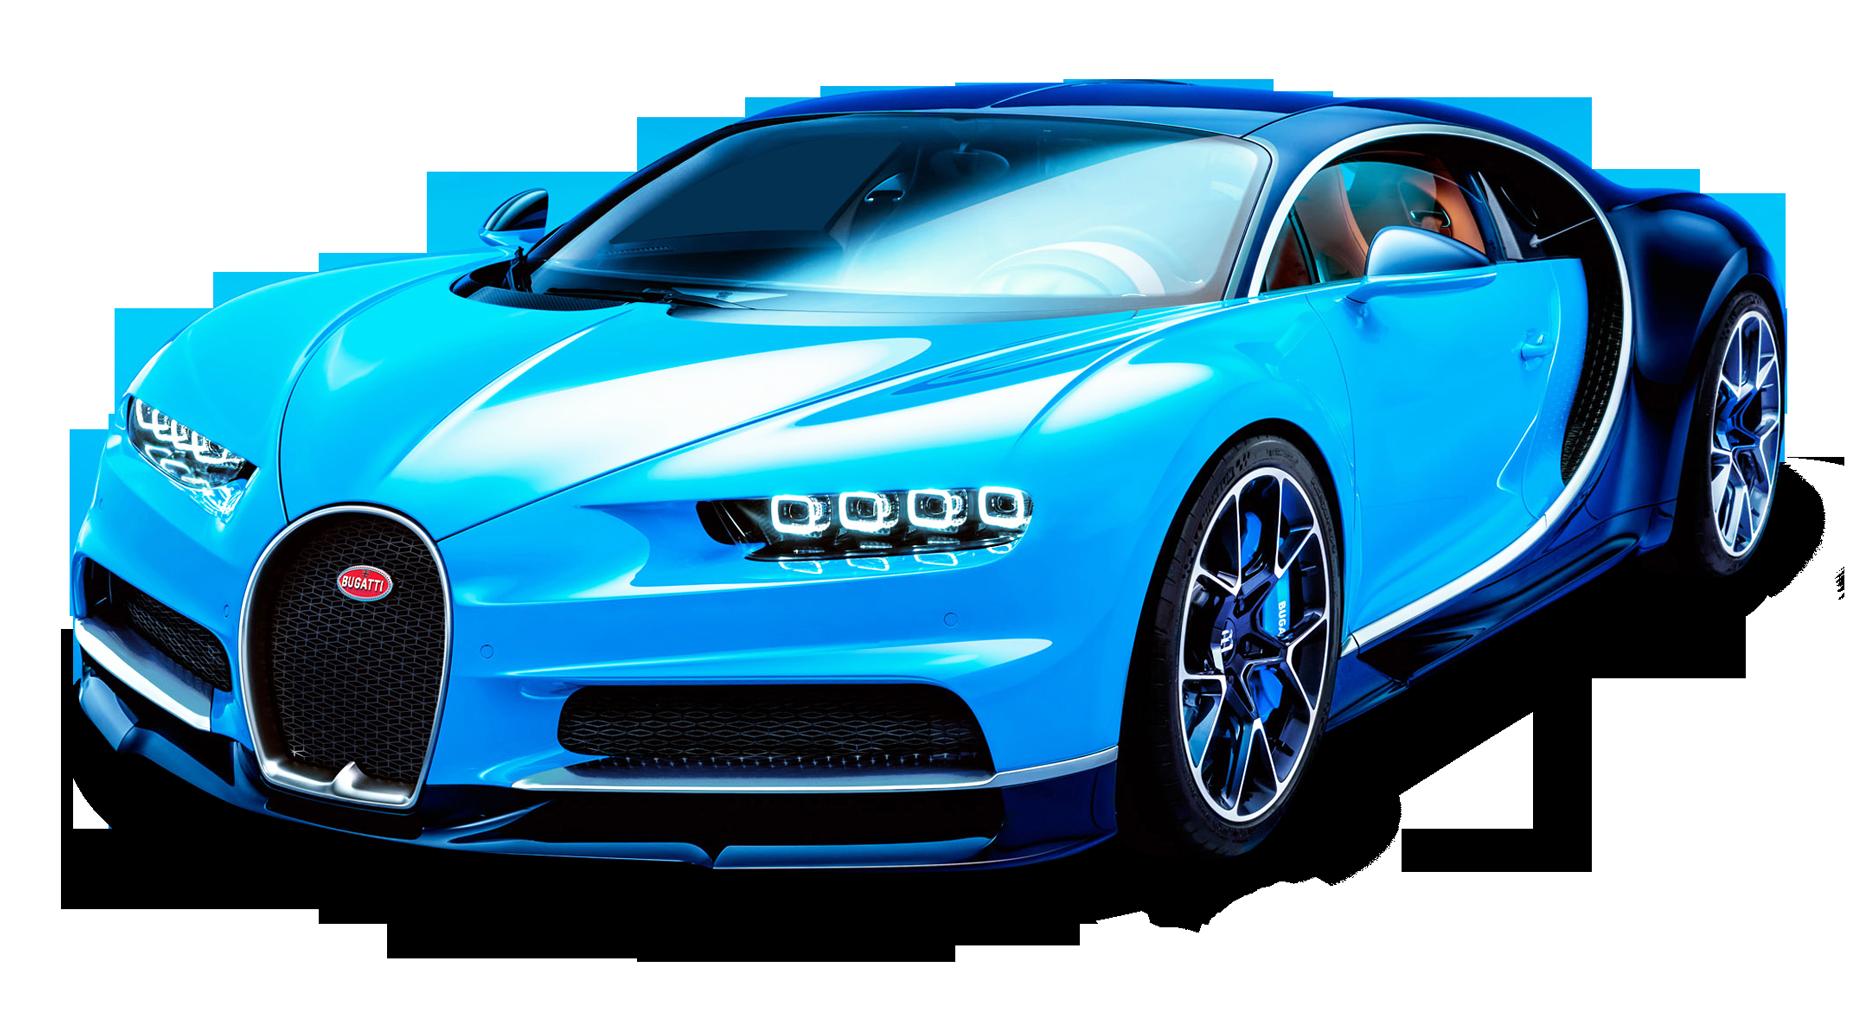 Sports Bugatti Car Pic image #31726 - Bugatti PNG